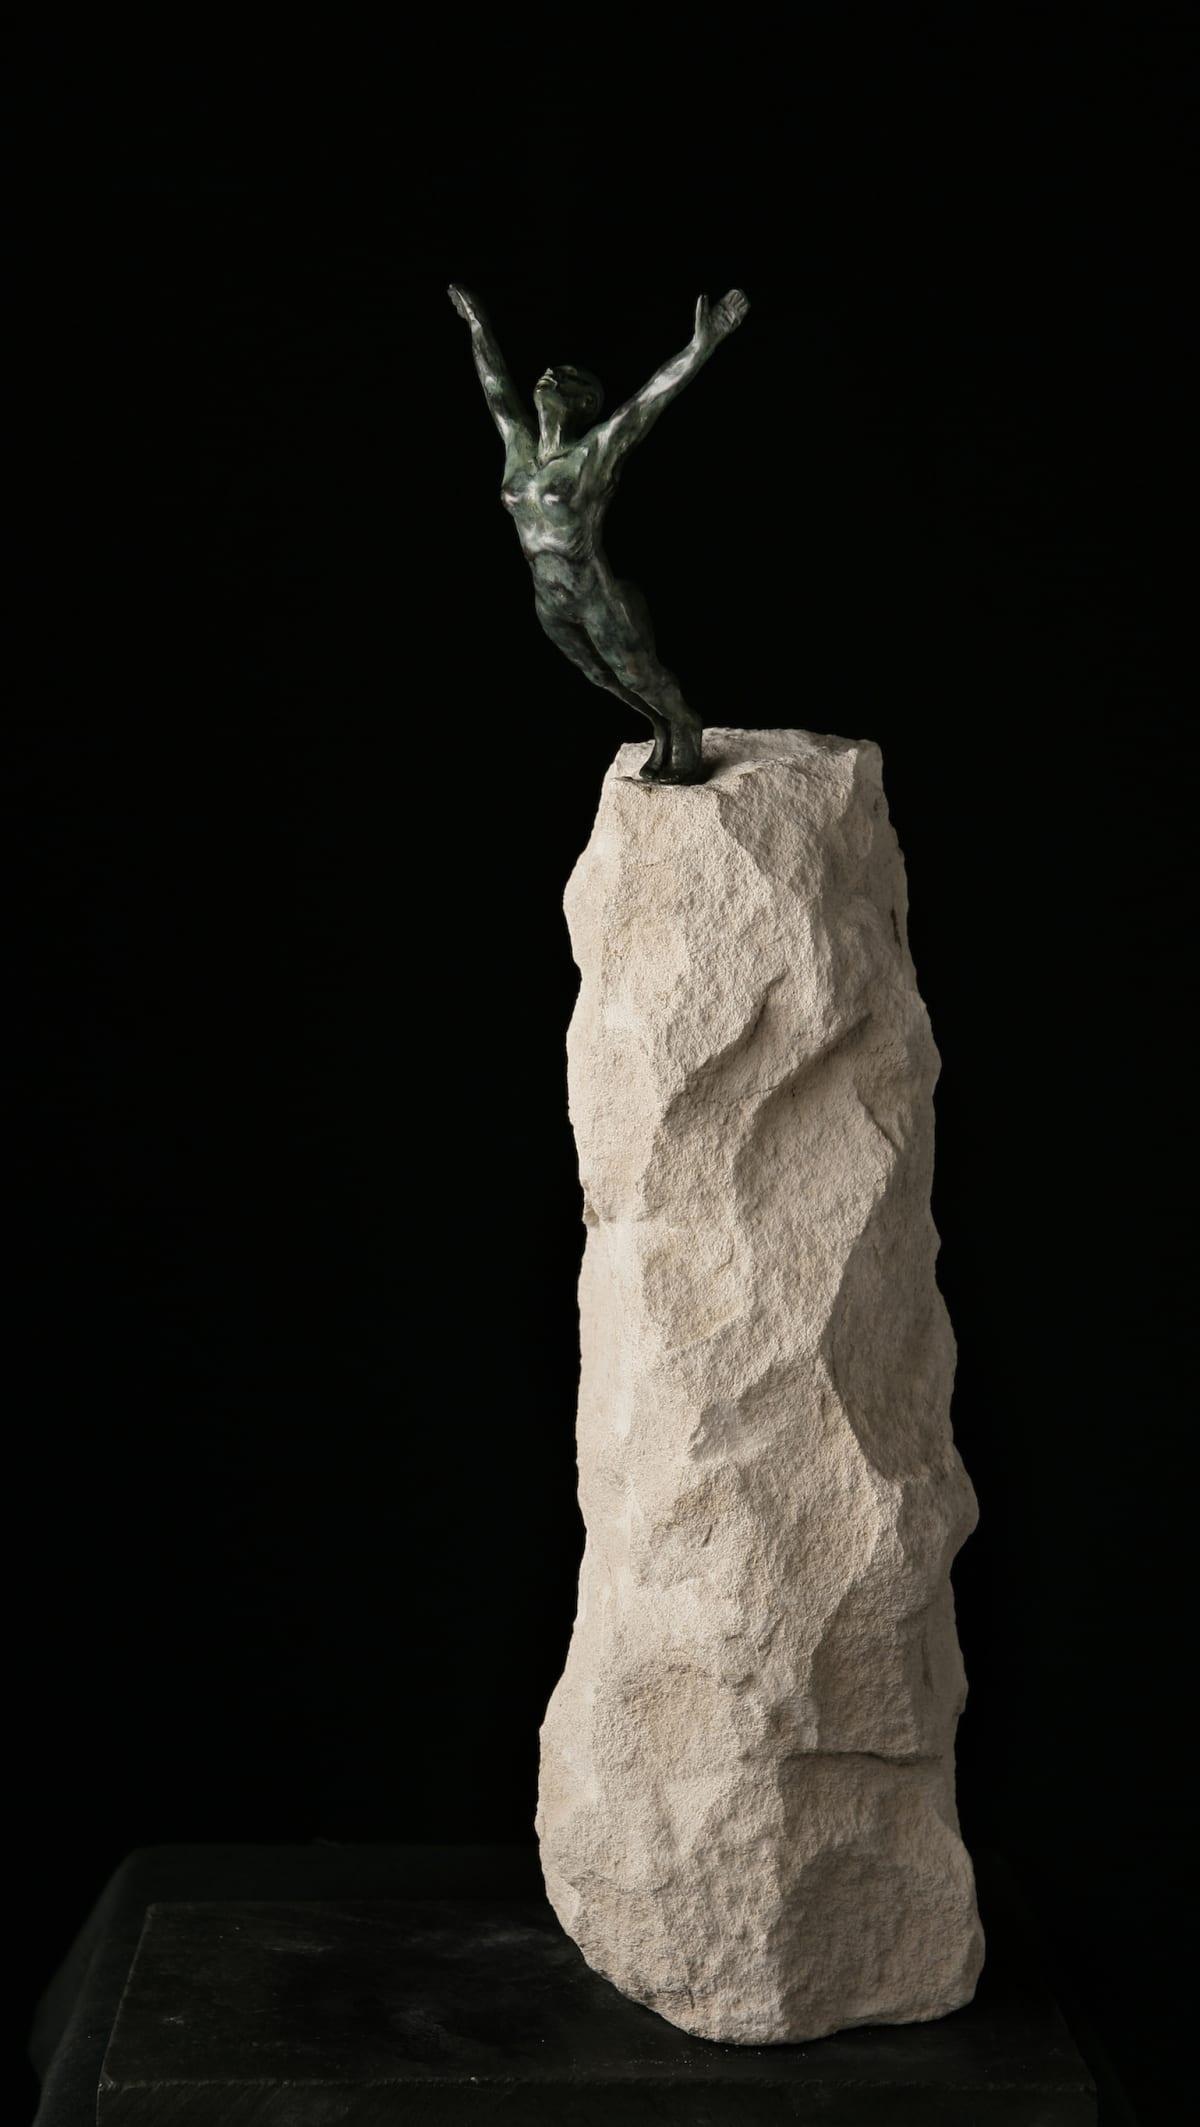 Brendon Murless Dive In, 2019 Bronze Sculpture 47 x 30 x 18 cm 18 1/2 x 11 3/4 x 7 1/8 in Edition 5 of 8